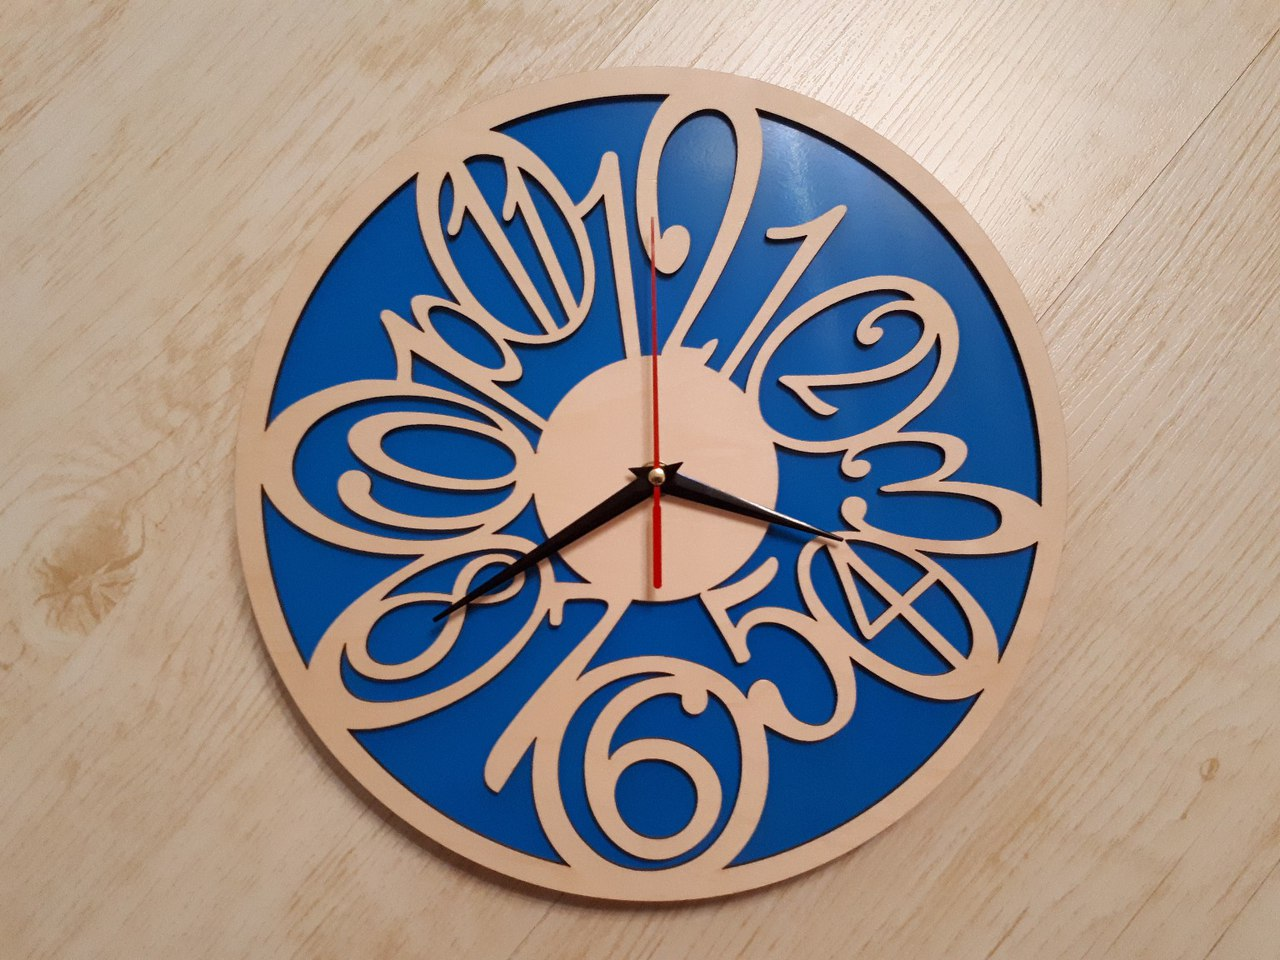 Plywood Clock Laser Cut File Free CDR Vectors Art